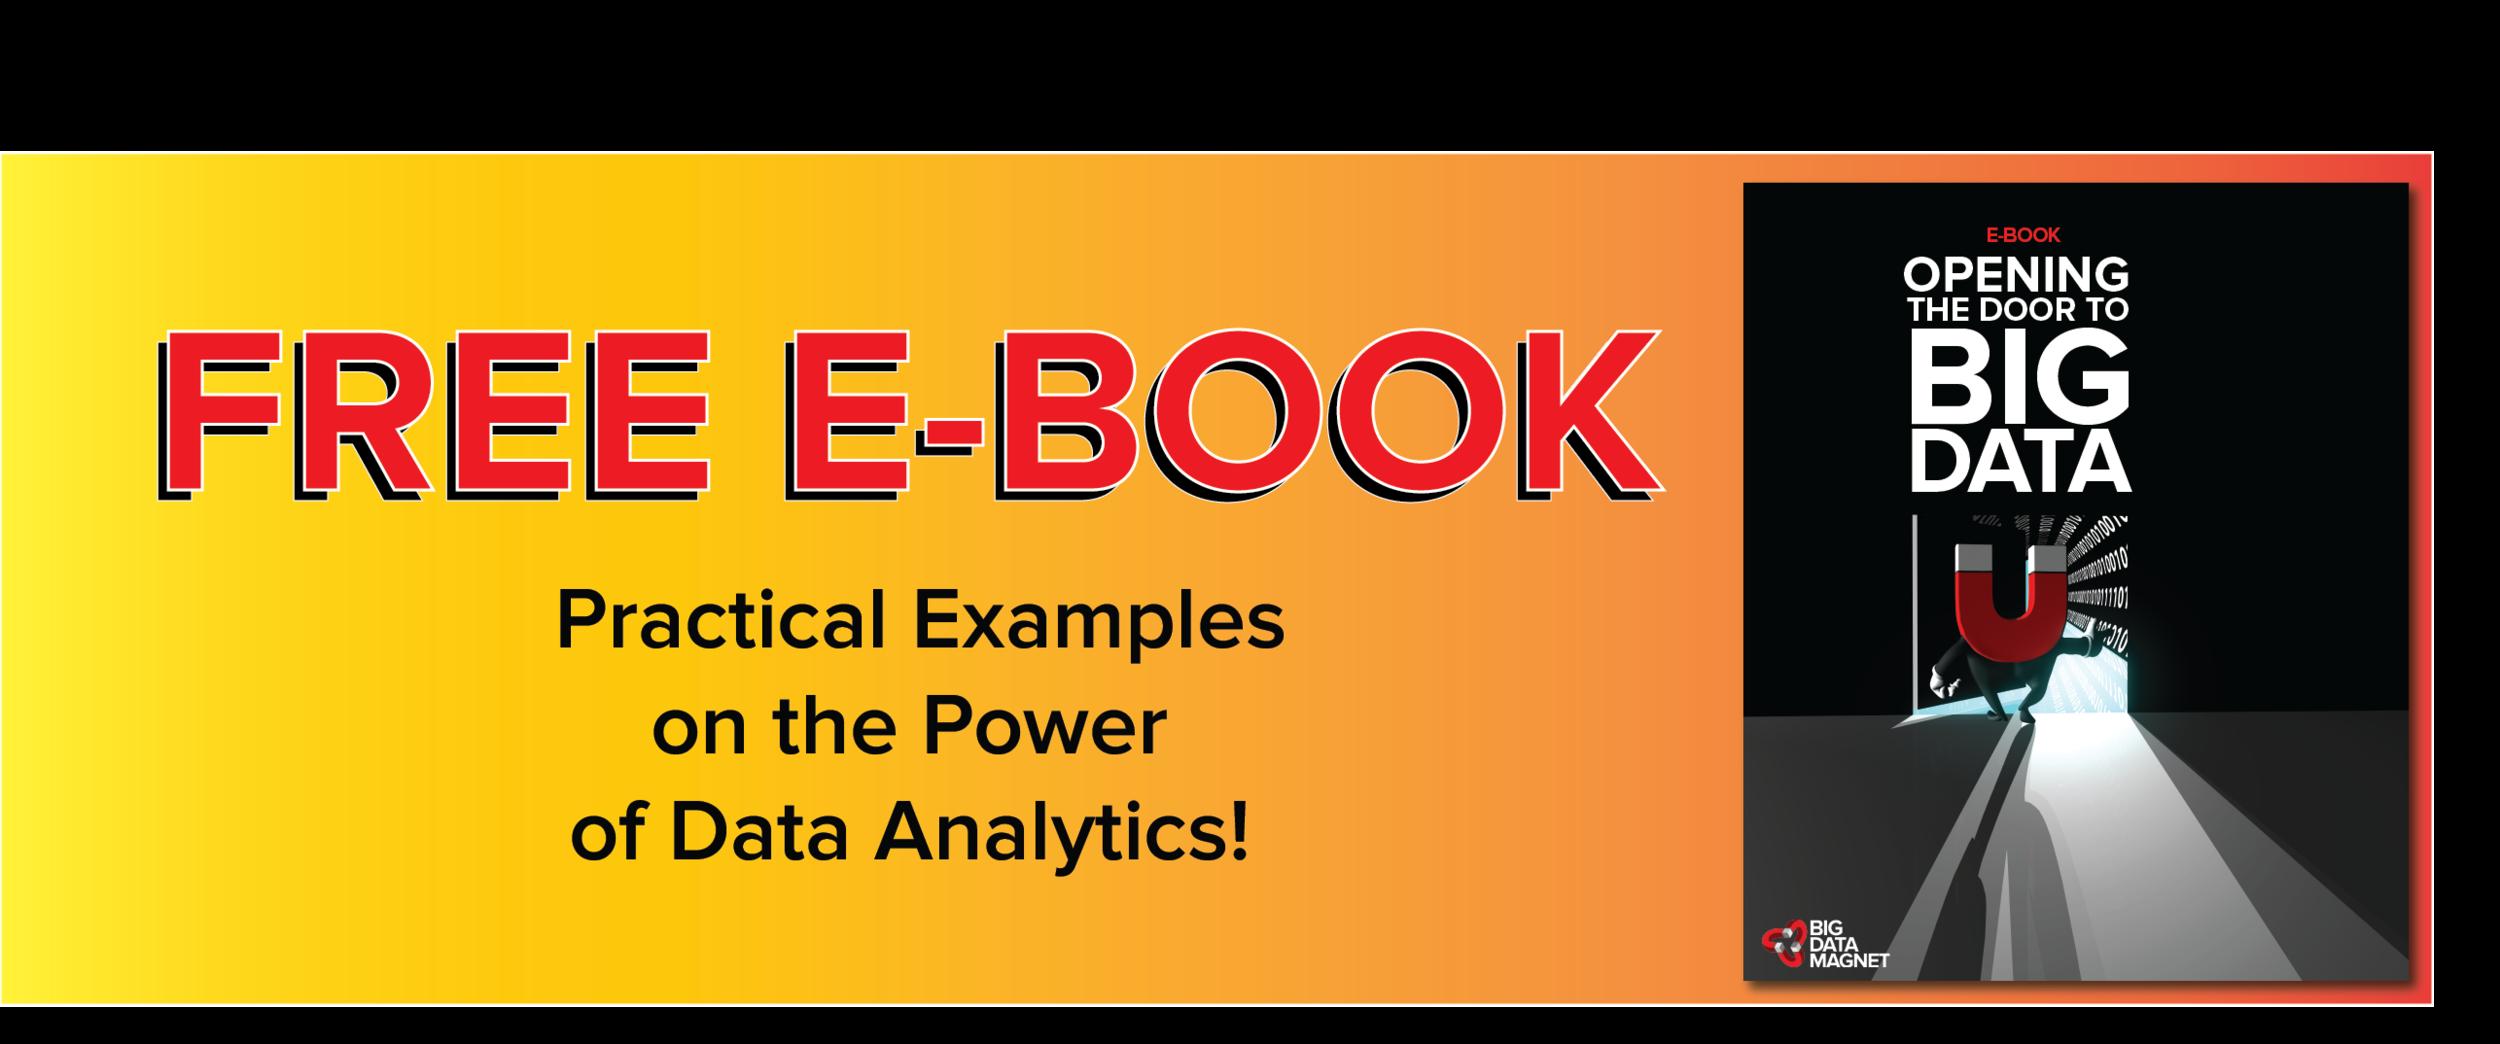 Free E-Book 2500 875 Big Data Magnet Mute Burst.png